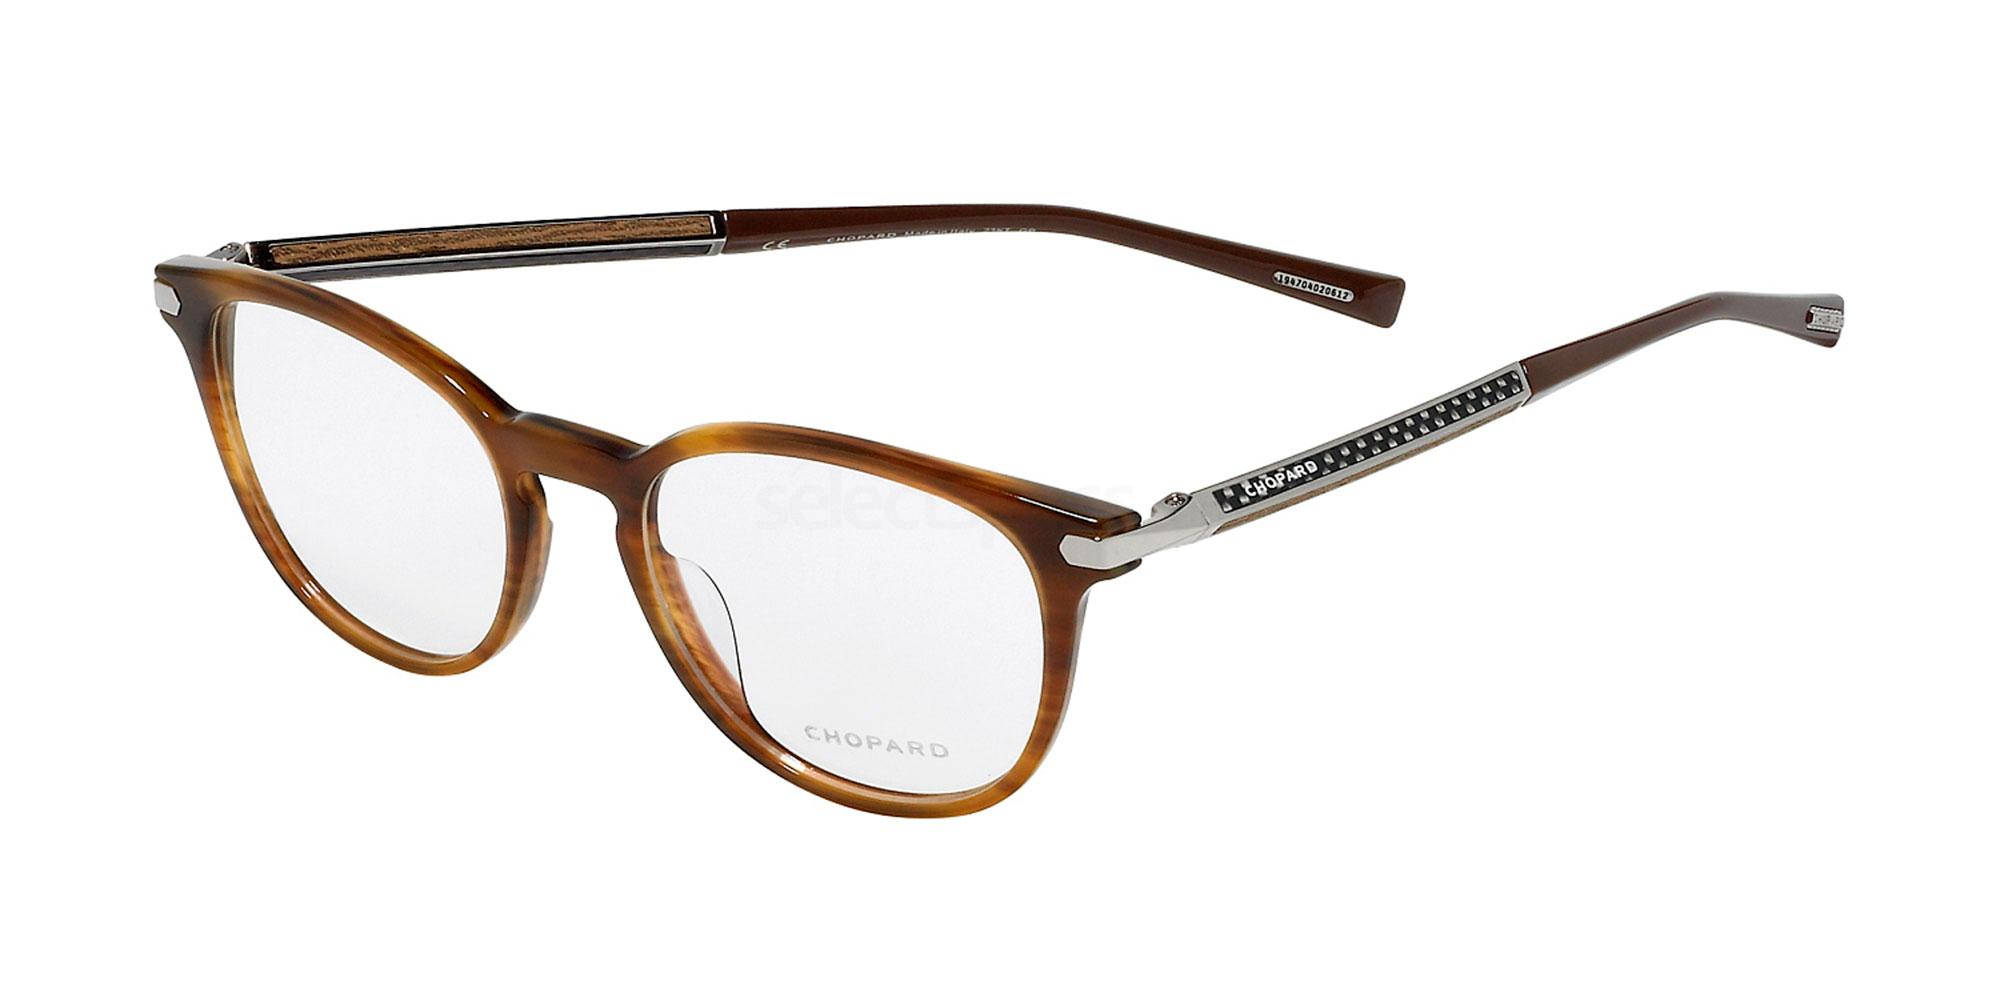 01F9 VCH250 Glasses, Chopard